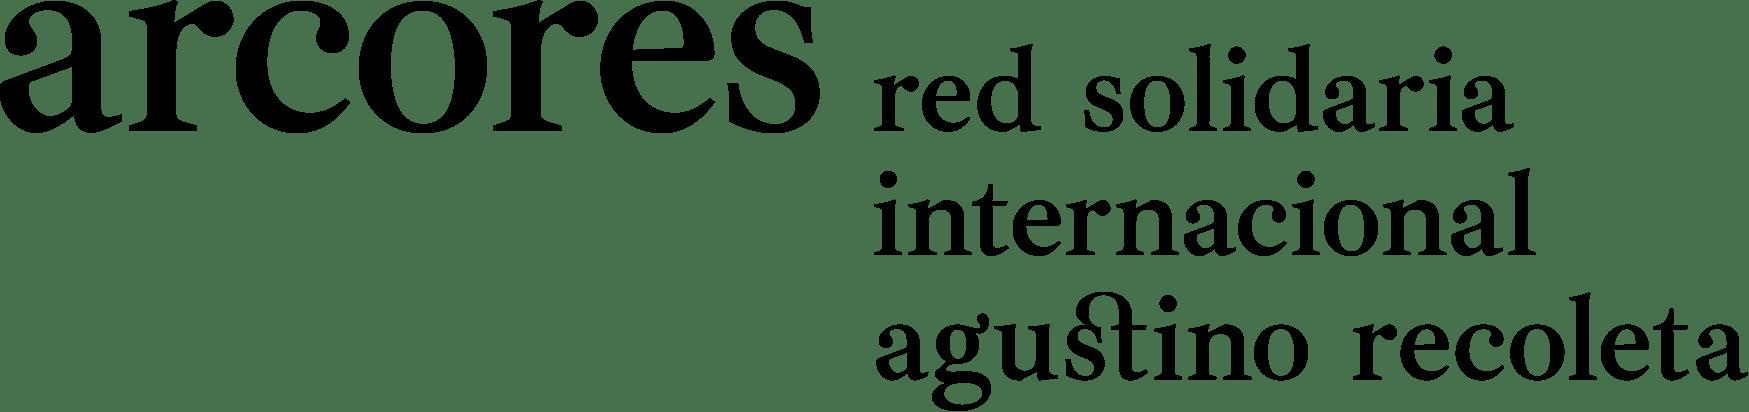 Arcores